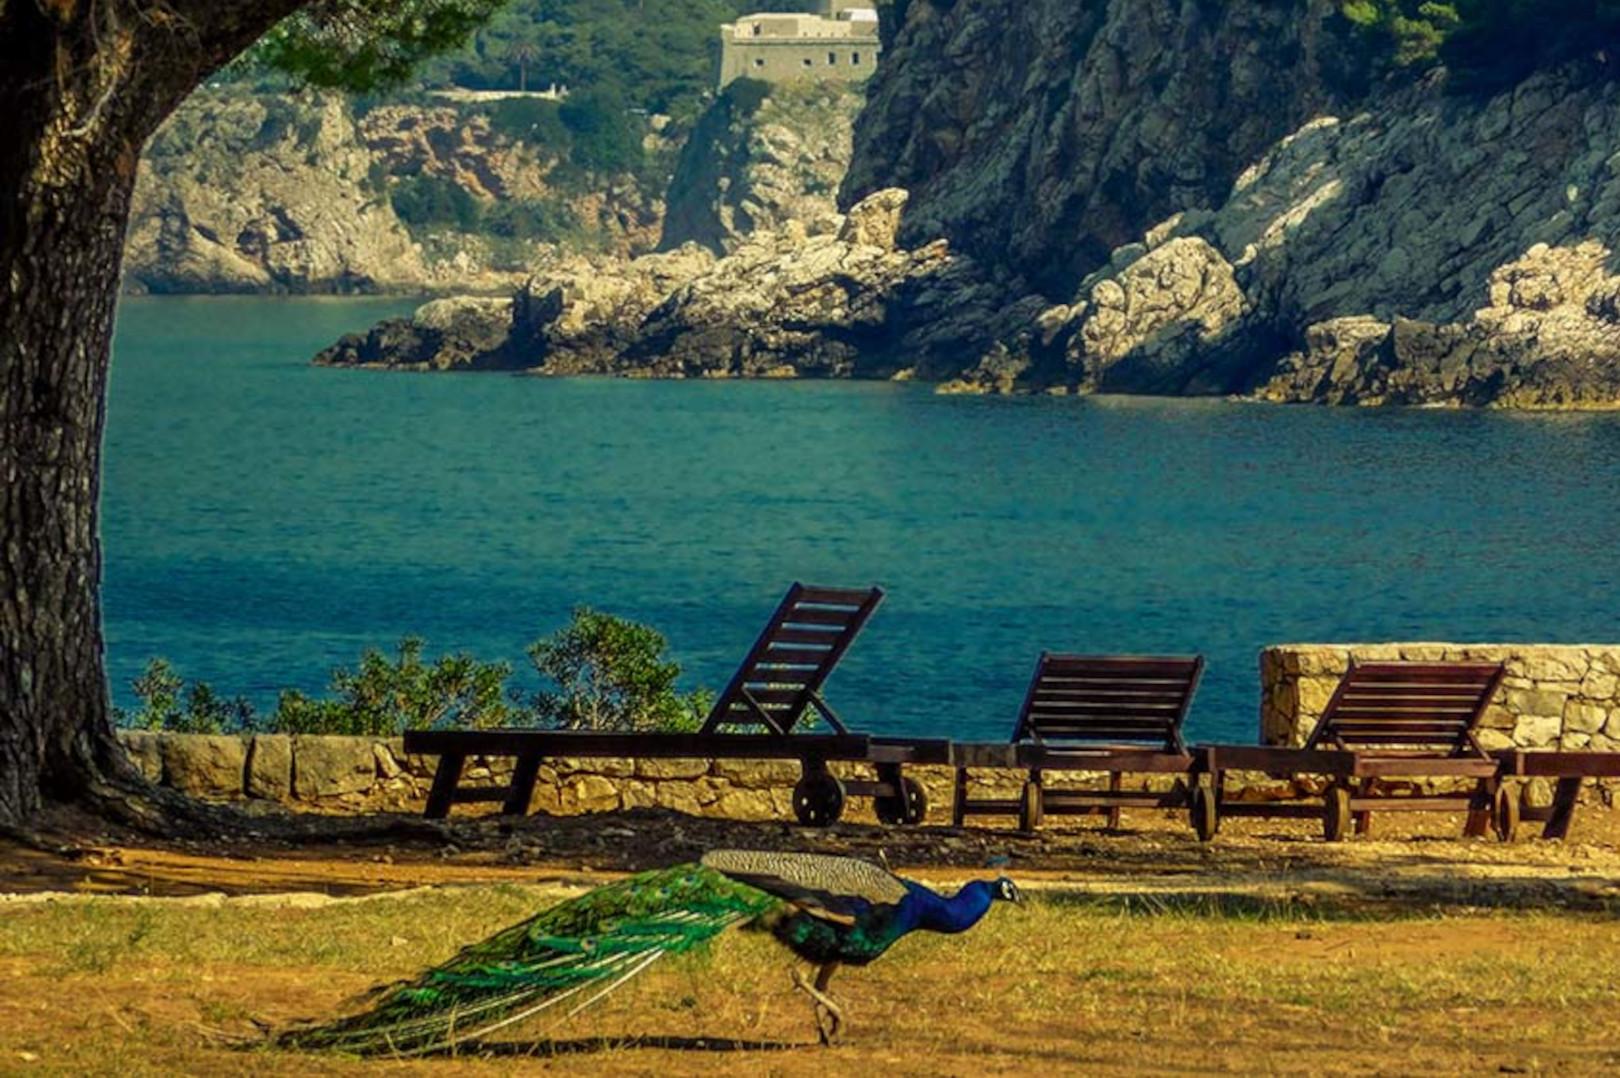 LOKRUM: Ukleti raj nadomak Dubrovnika